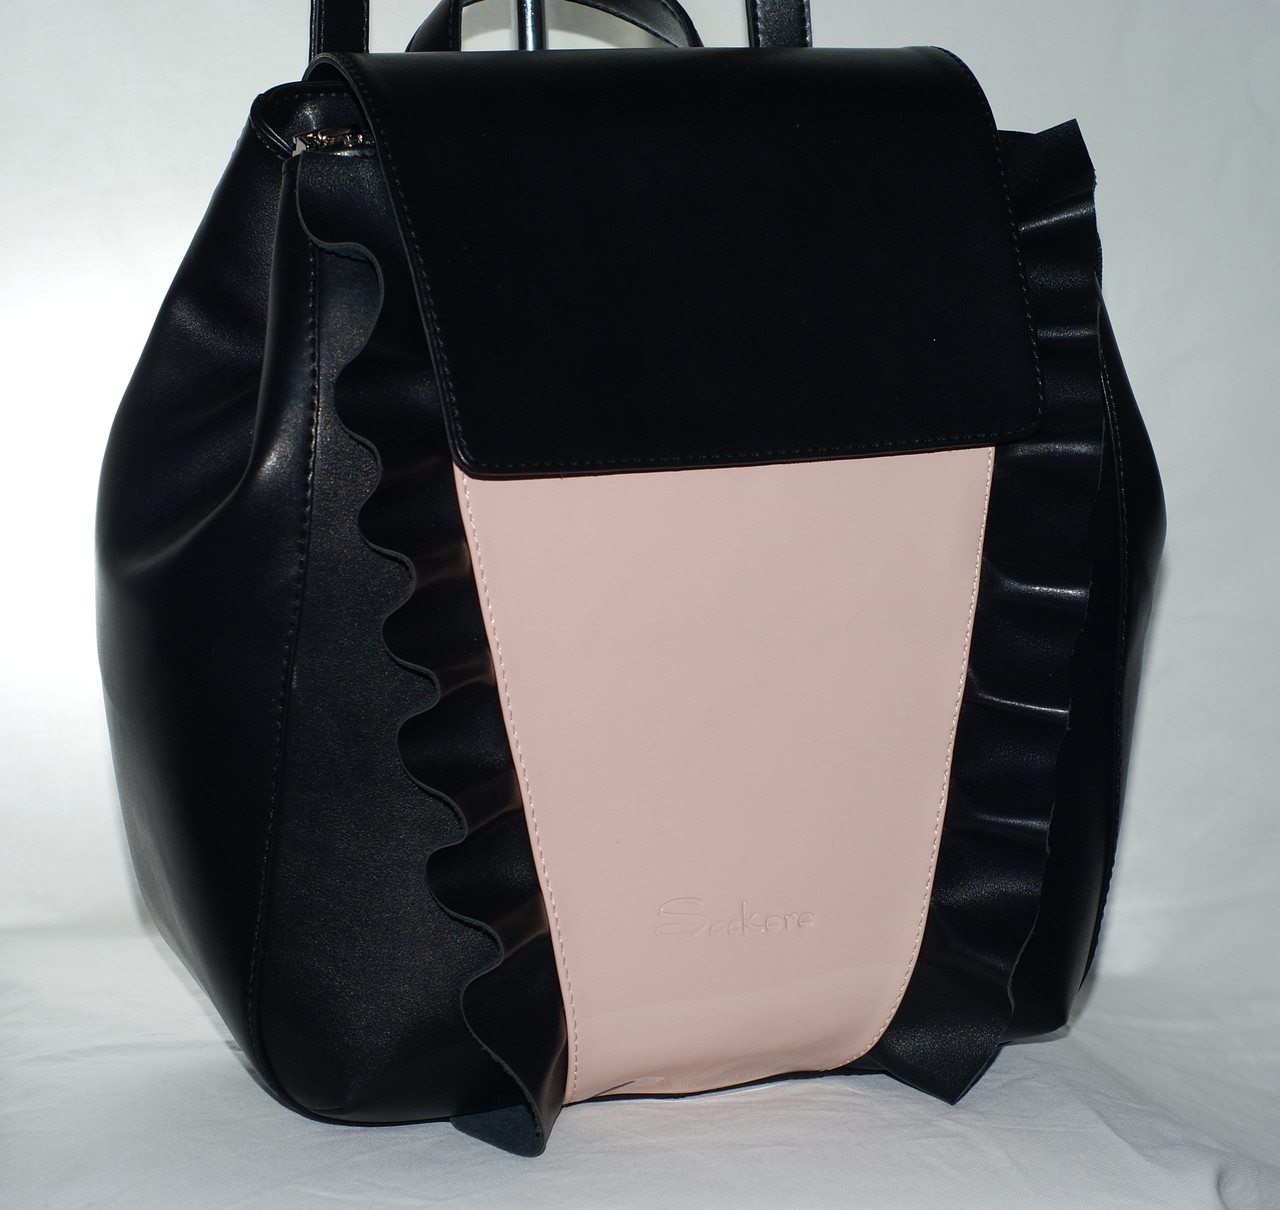 f693cda4278f Стильная женская сумка-рюкзак от производителя: продажа, цена в ...